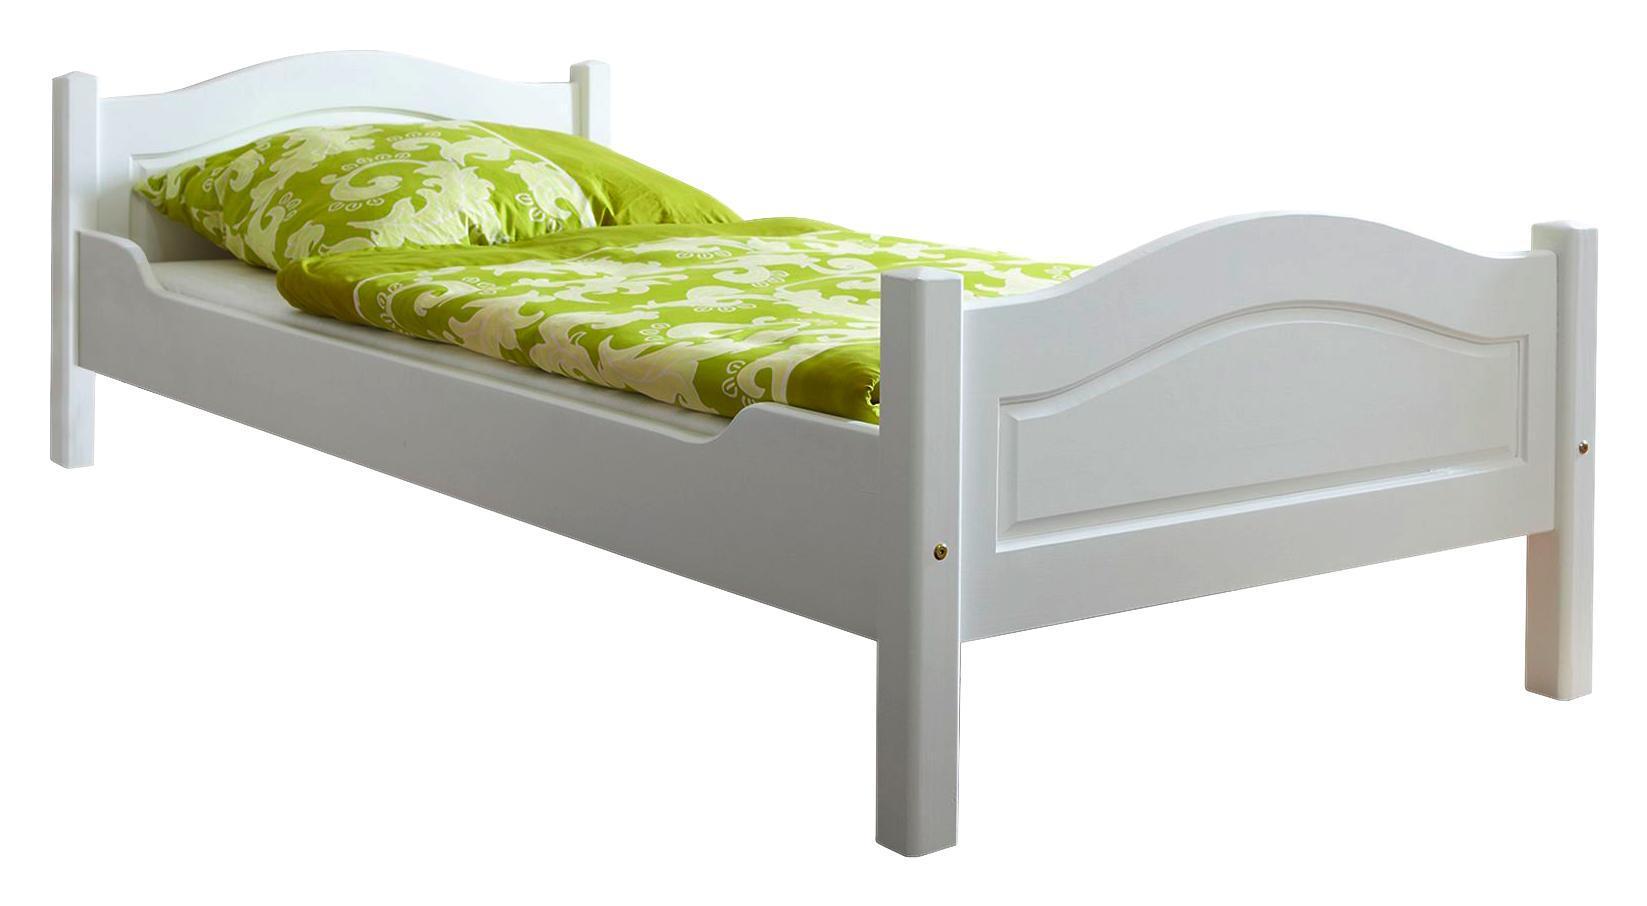 Wood Select Fu/ß f/ür Bett mehrere Befestigungsarten 25 cm